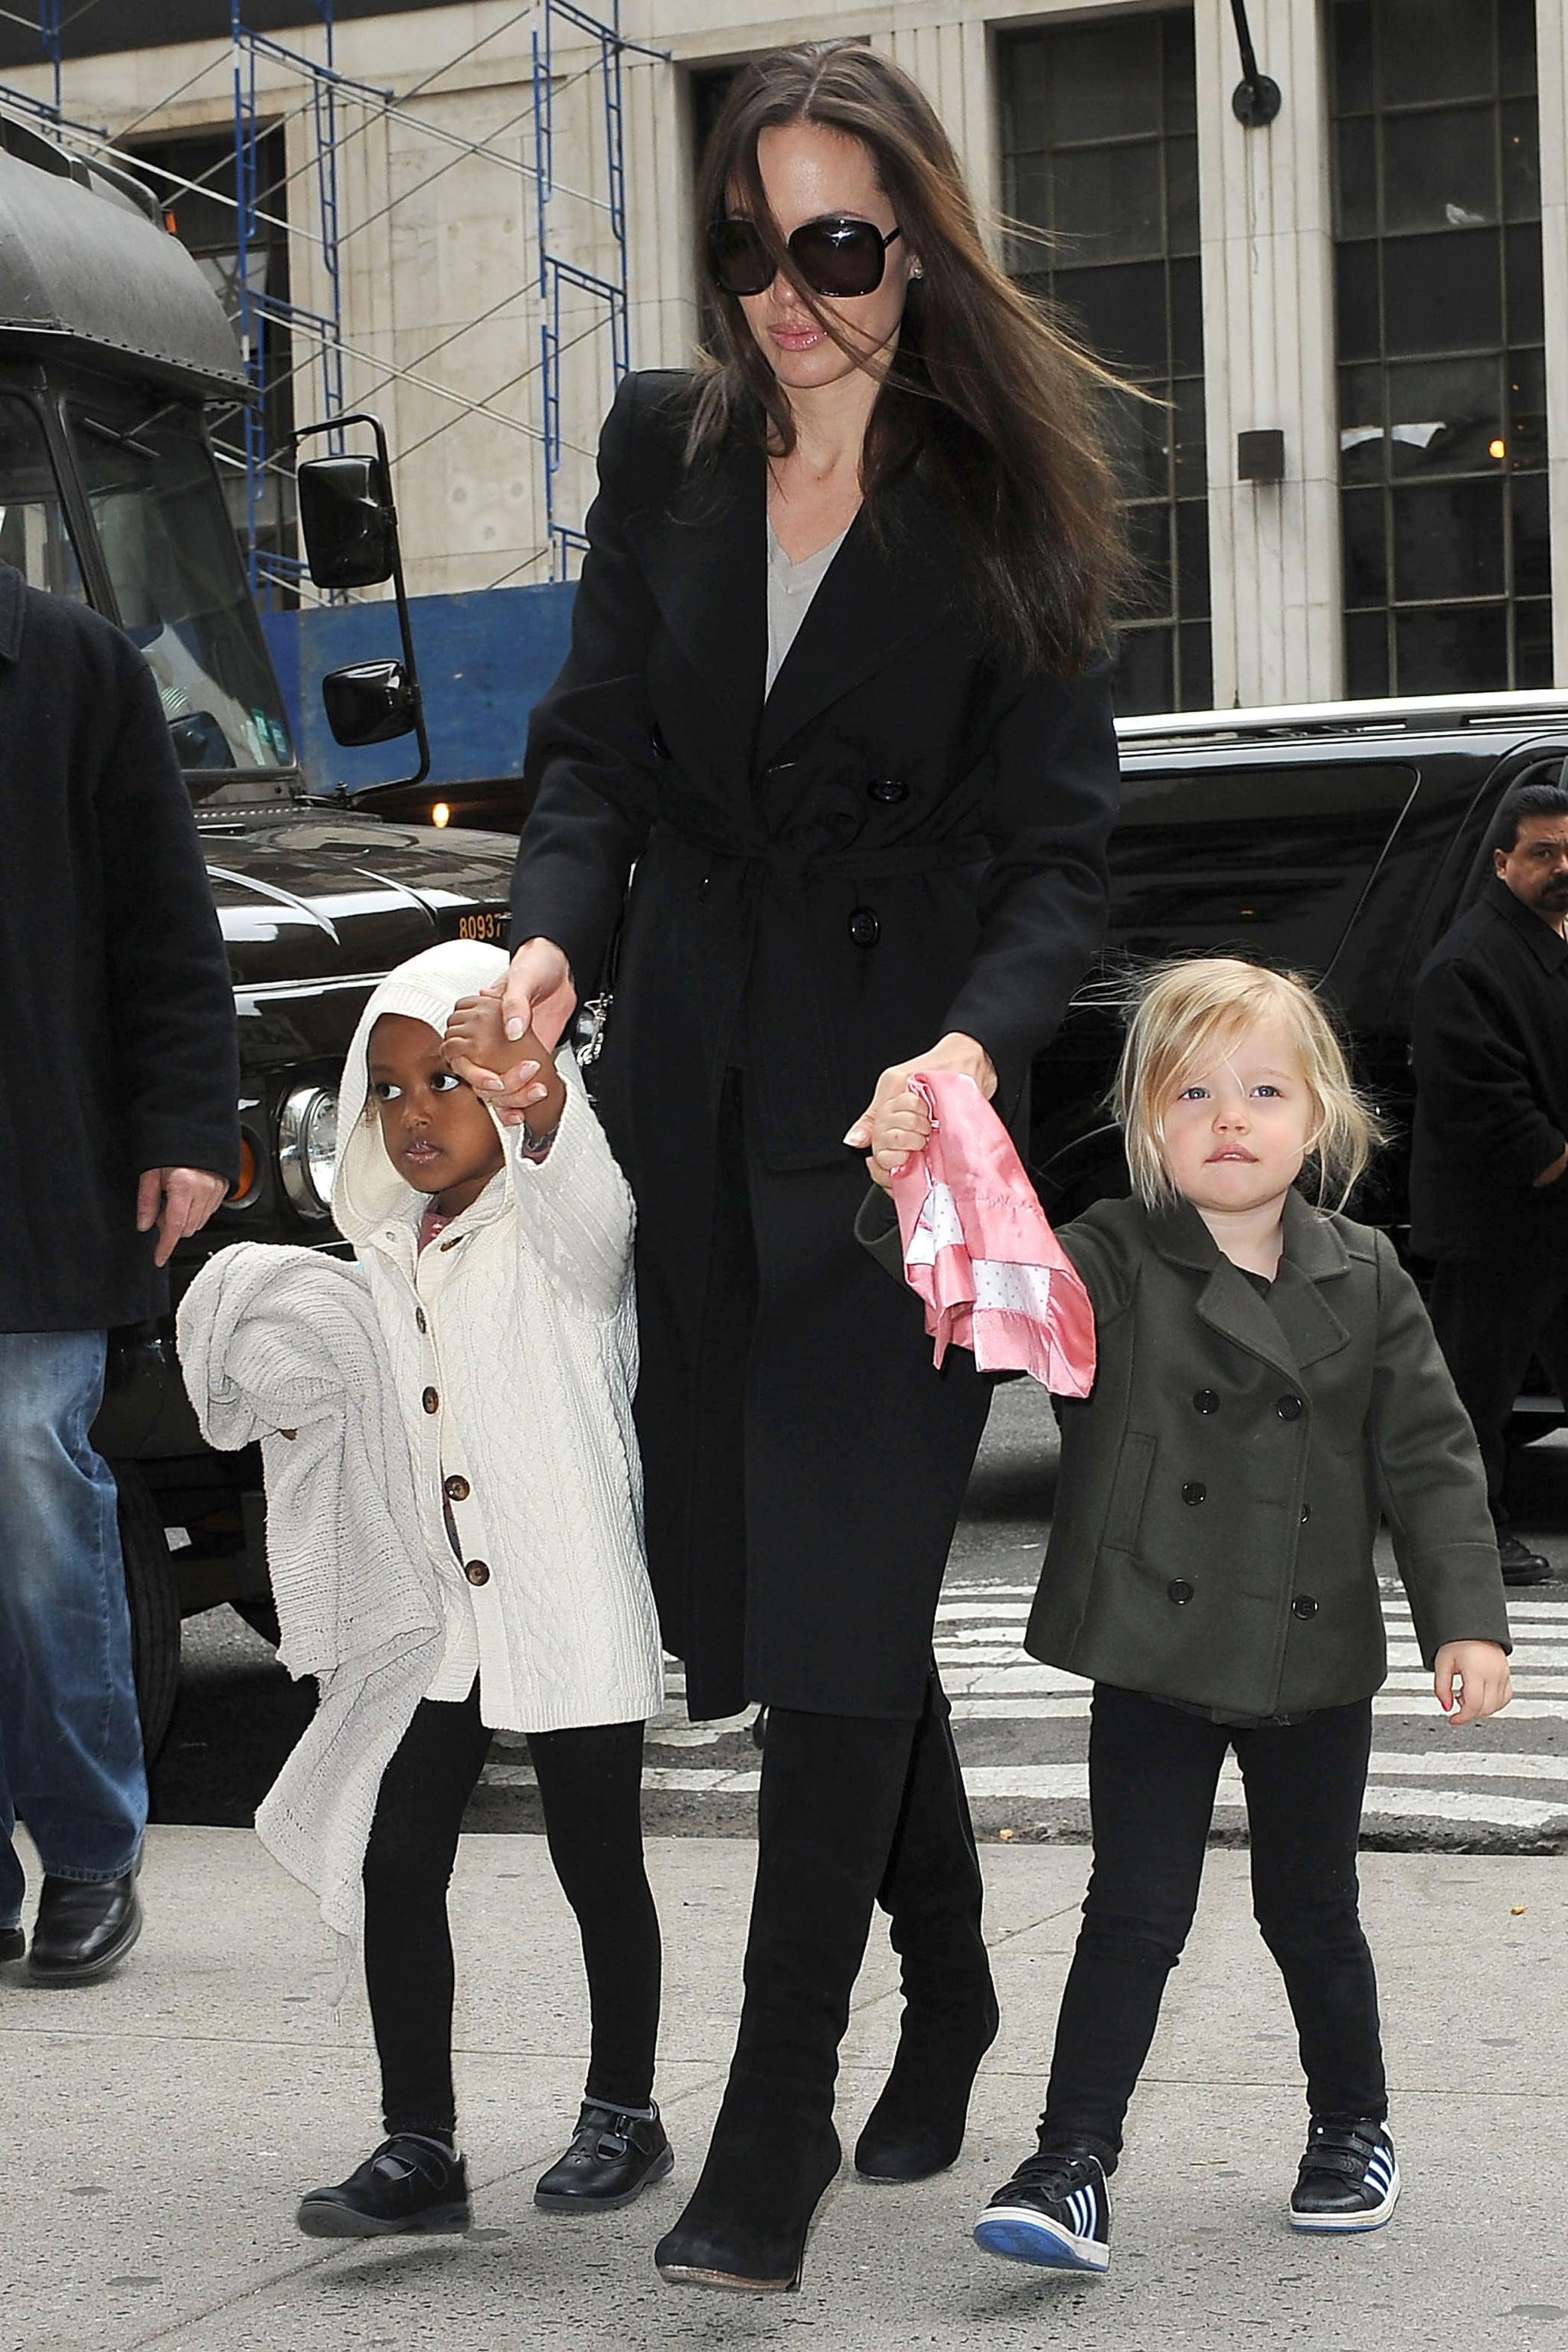 Photos of Angelina Jolie with Shiloh and Zahara in NYC